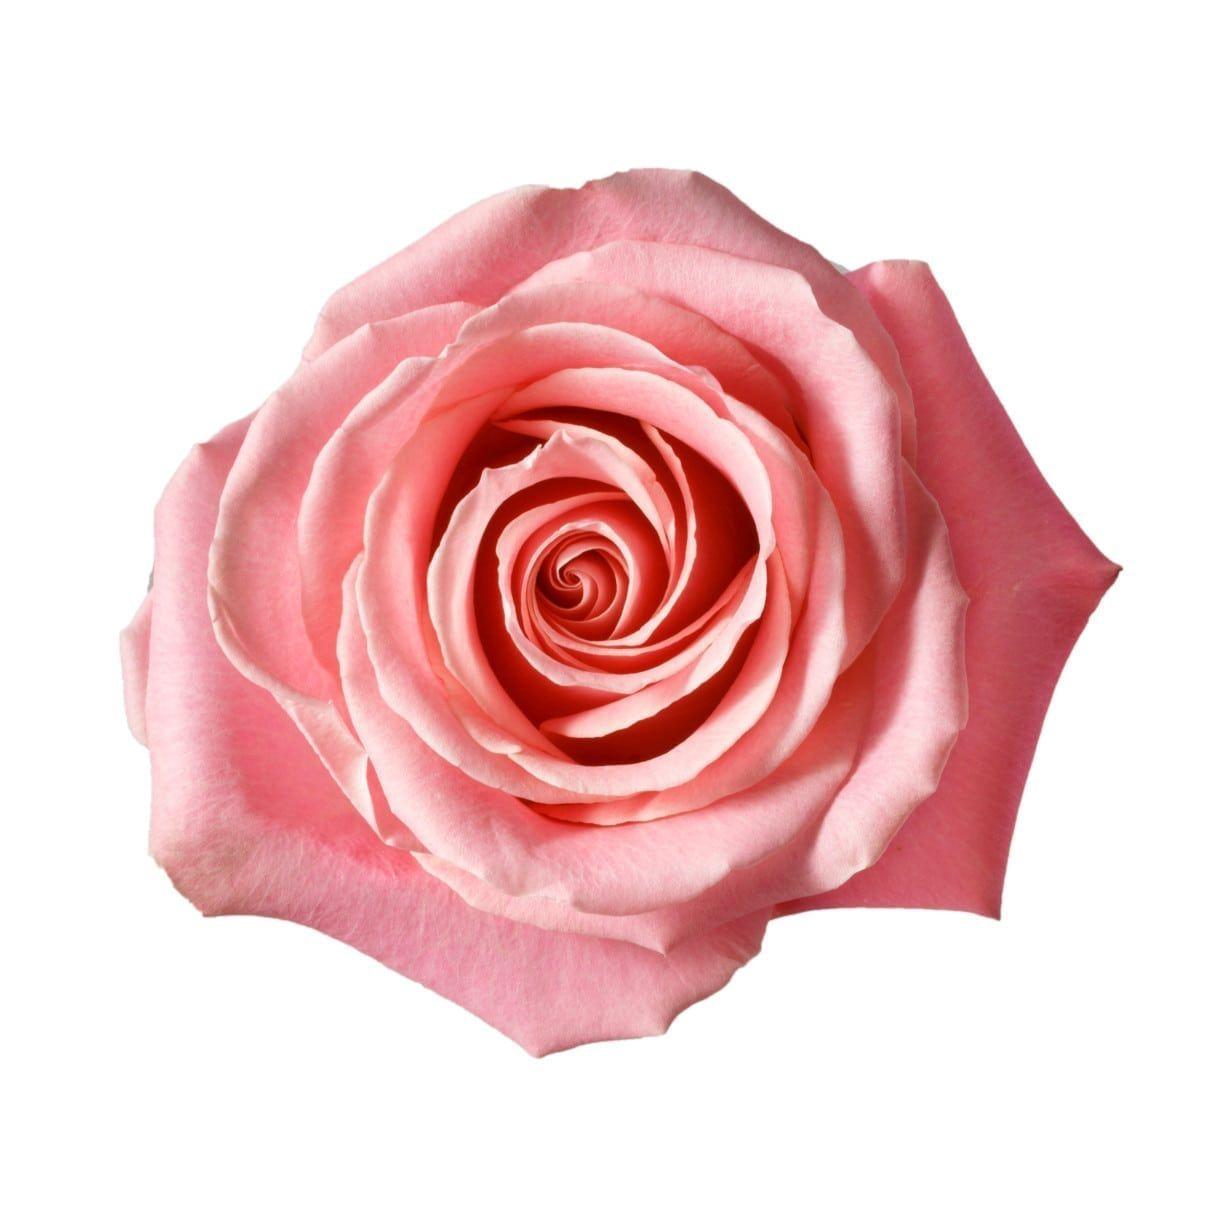 Hermosa Rose Hot Pink Roses Rose Pink Petals